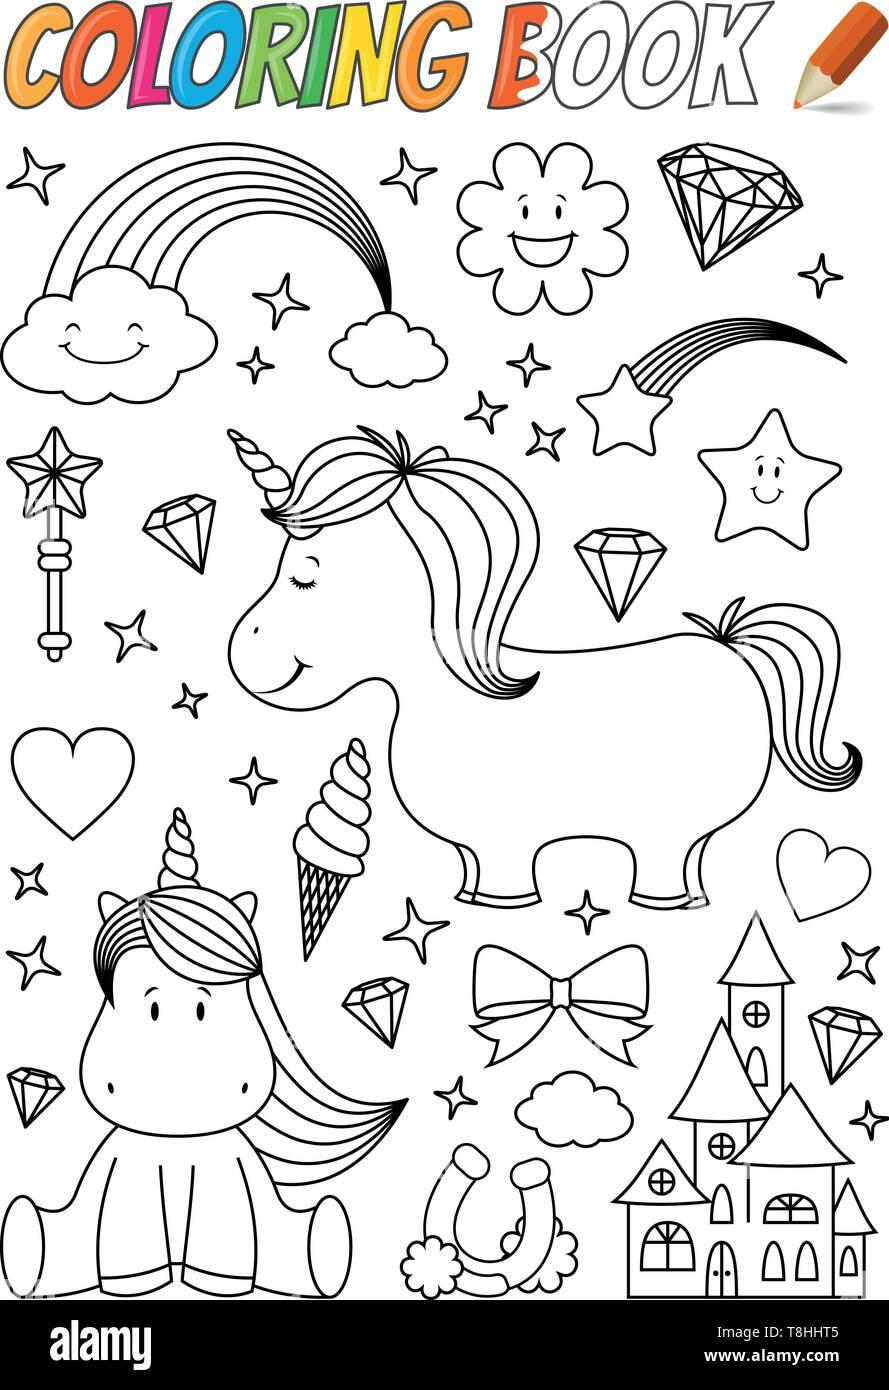 unicorn coloring book template Stock Vector Art ...